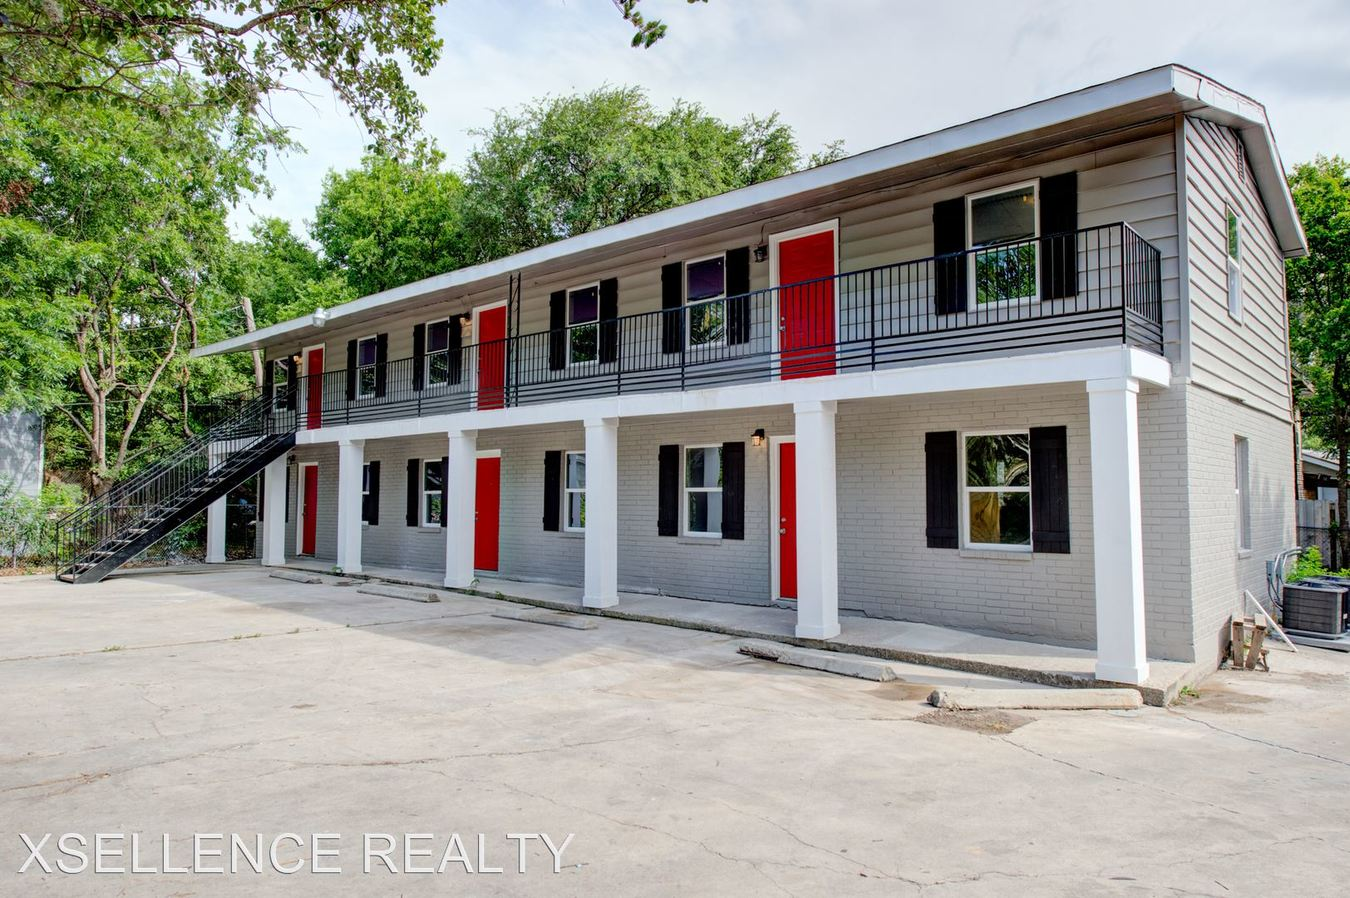 1 Bedroom 1 Bathroom Apartment for rent at 218 Natalen in San Antonio, TX